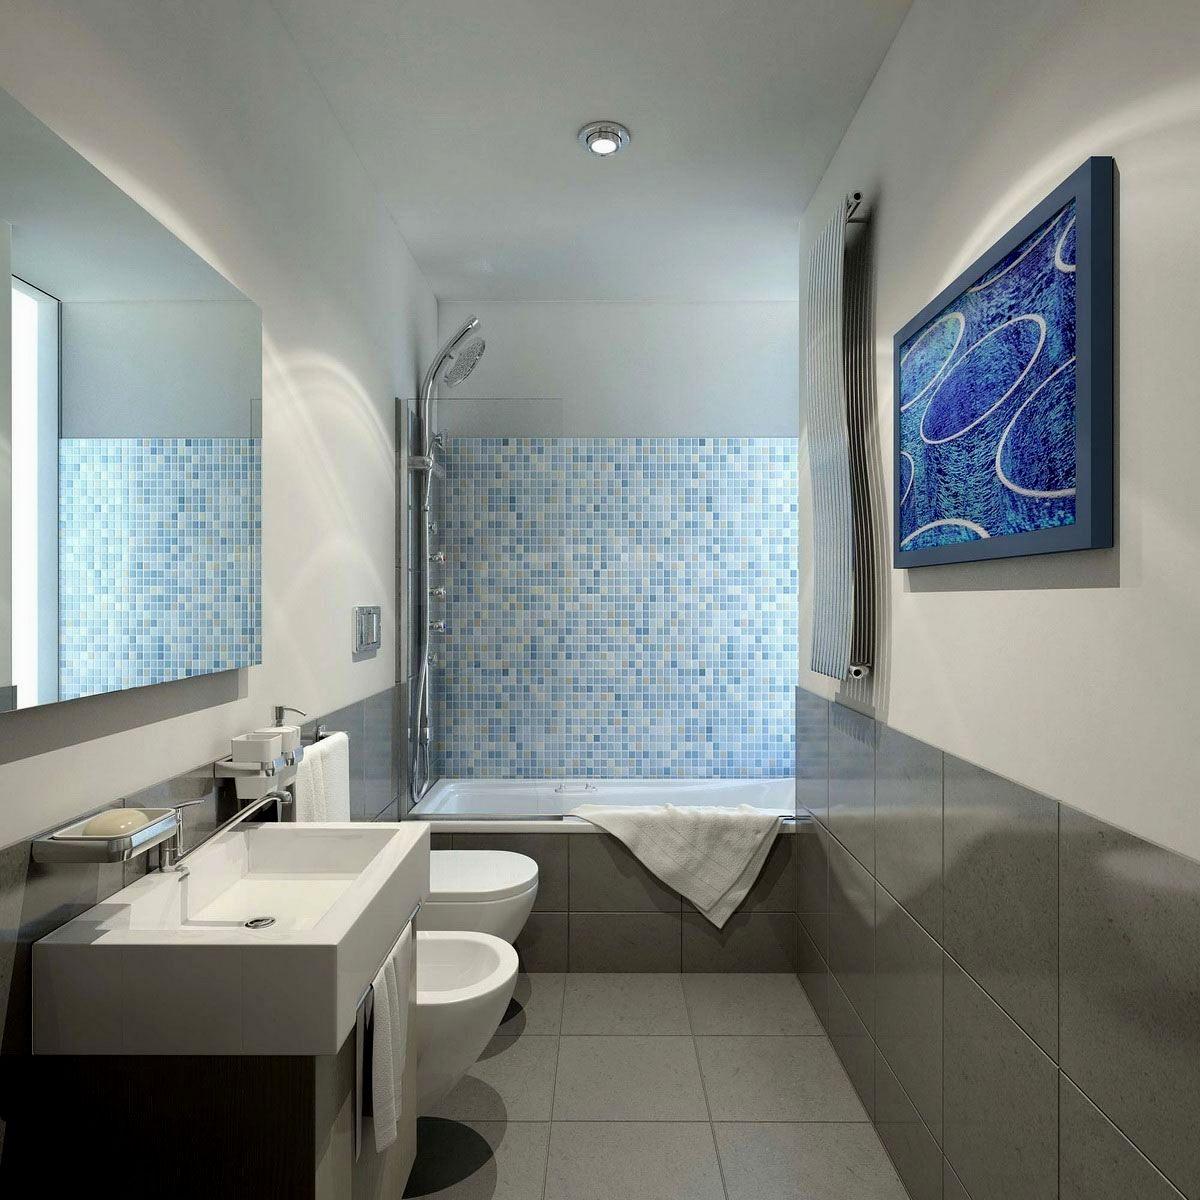 Modern White Floor Tile Bathroom Image - Bathroom Design Ideas ...